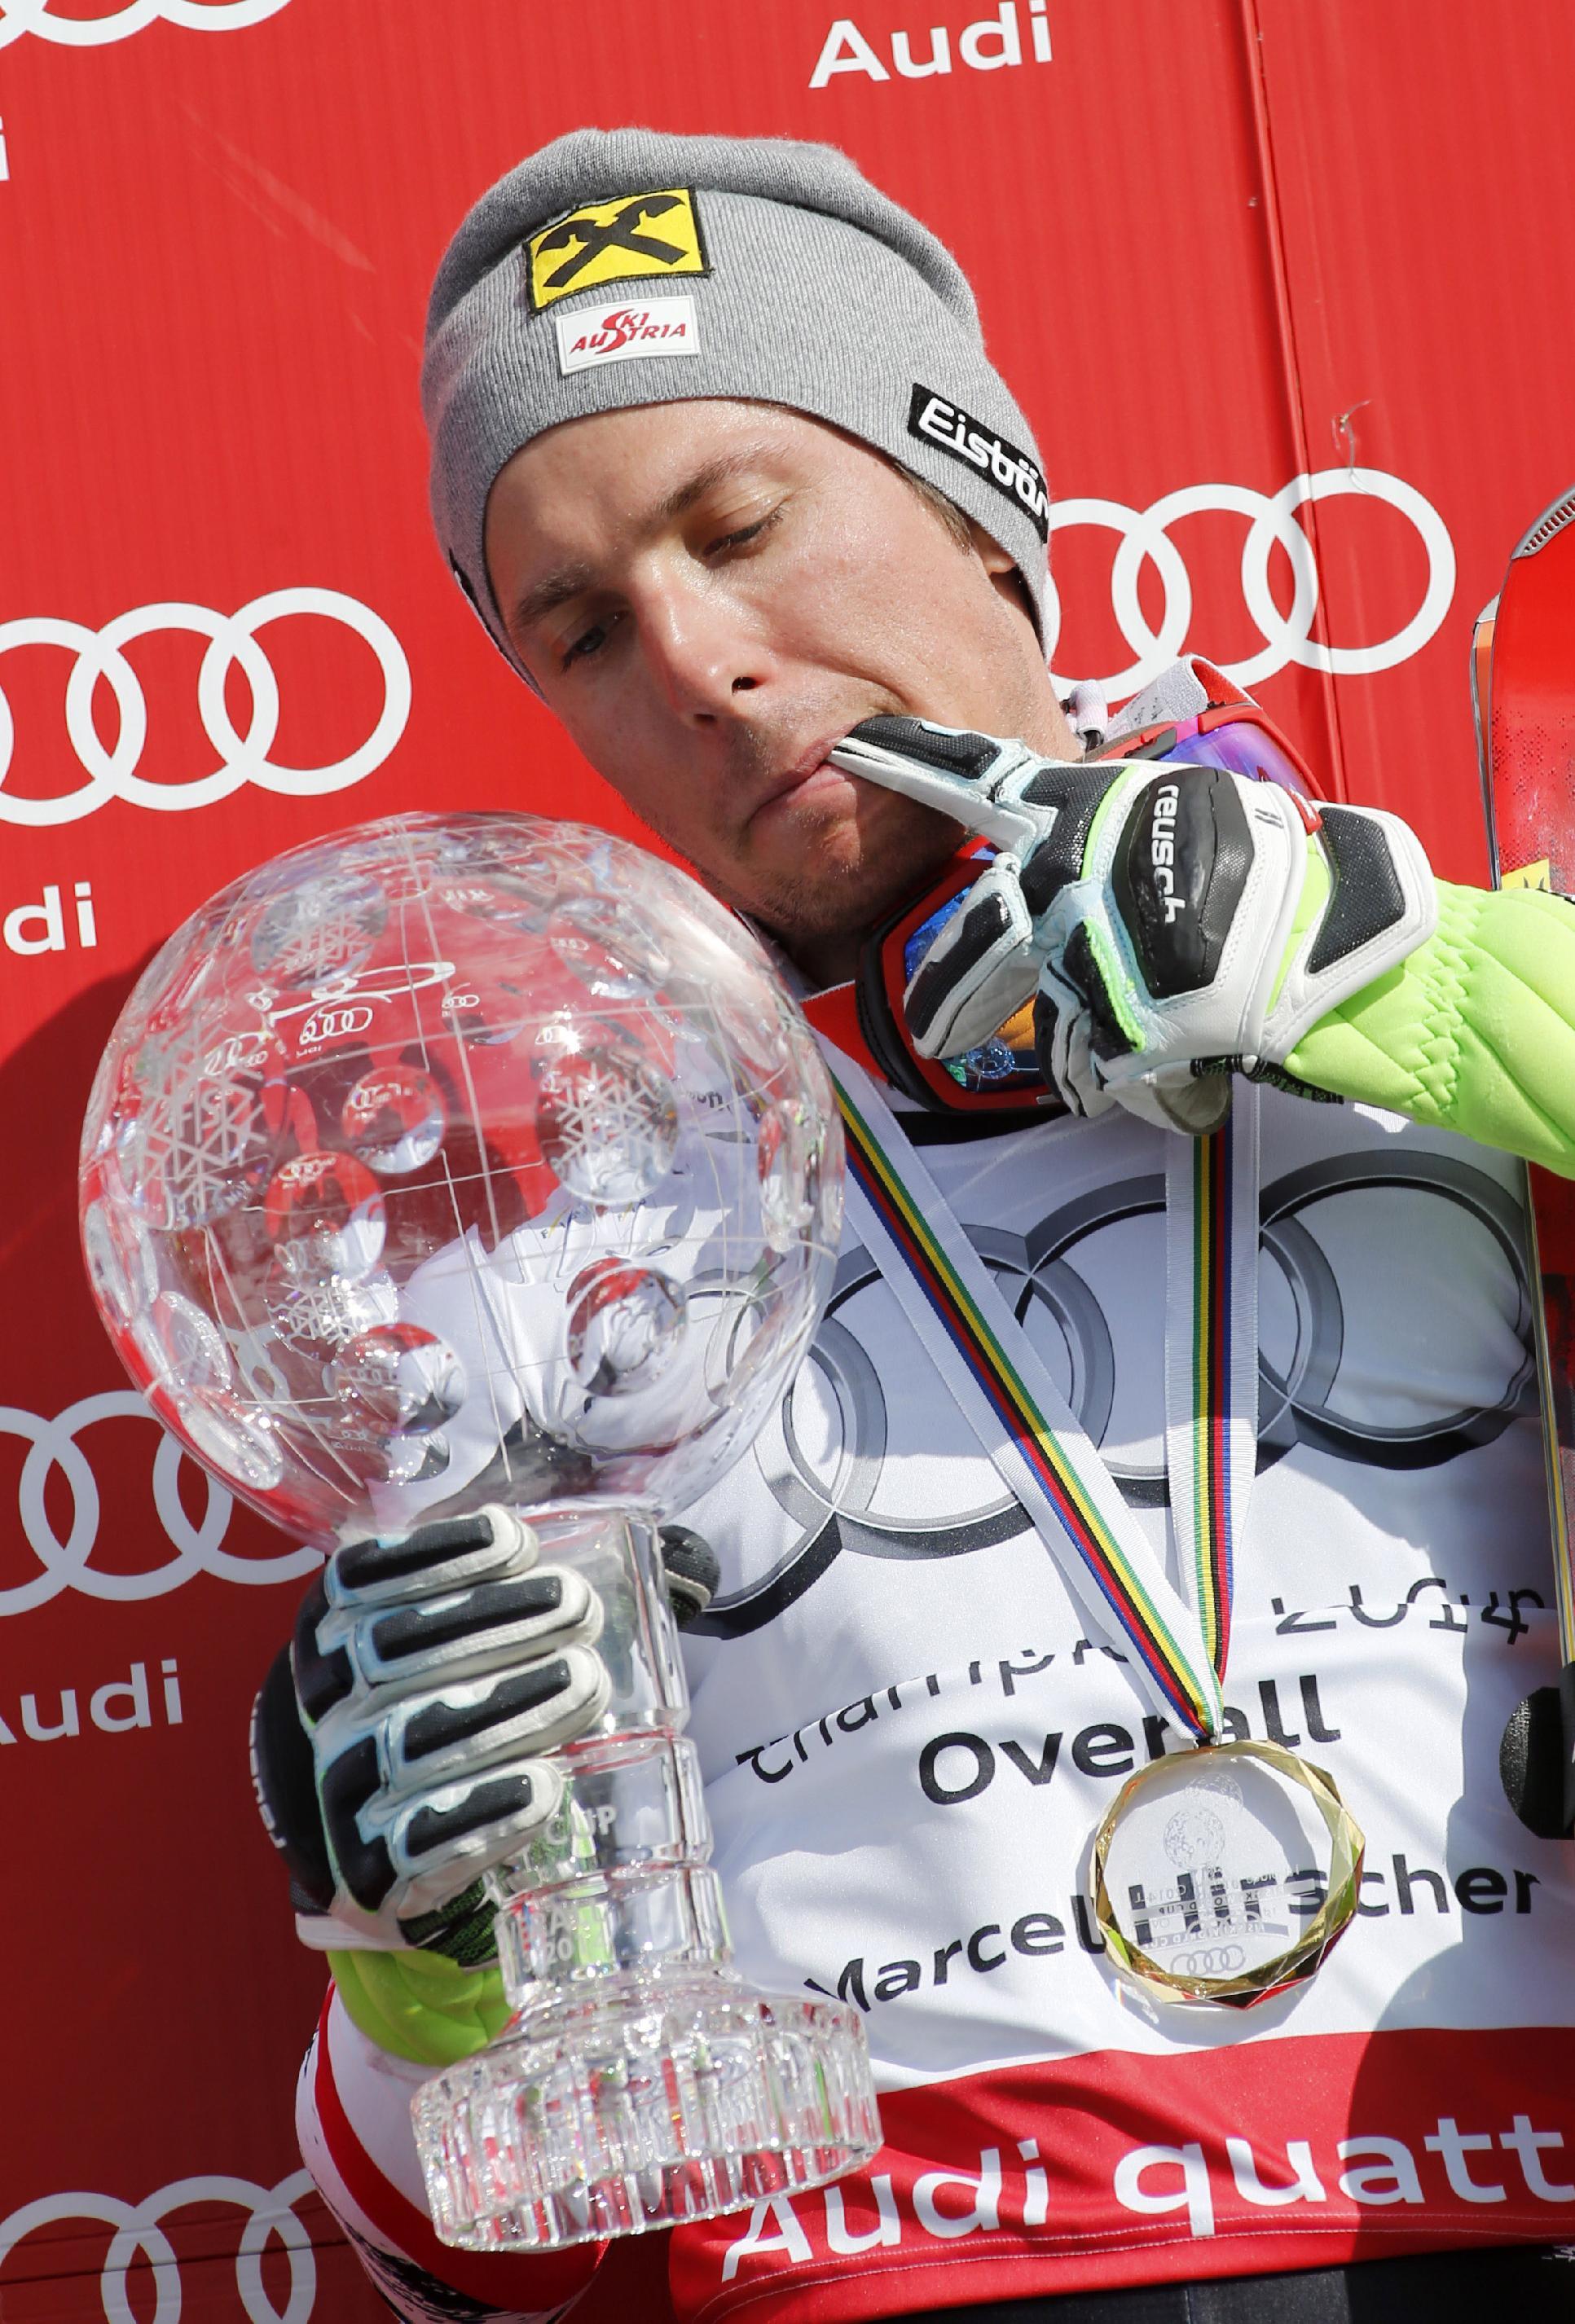 Austria's Hirscher, Fenninger sweep at WCup Finals